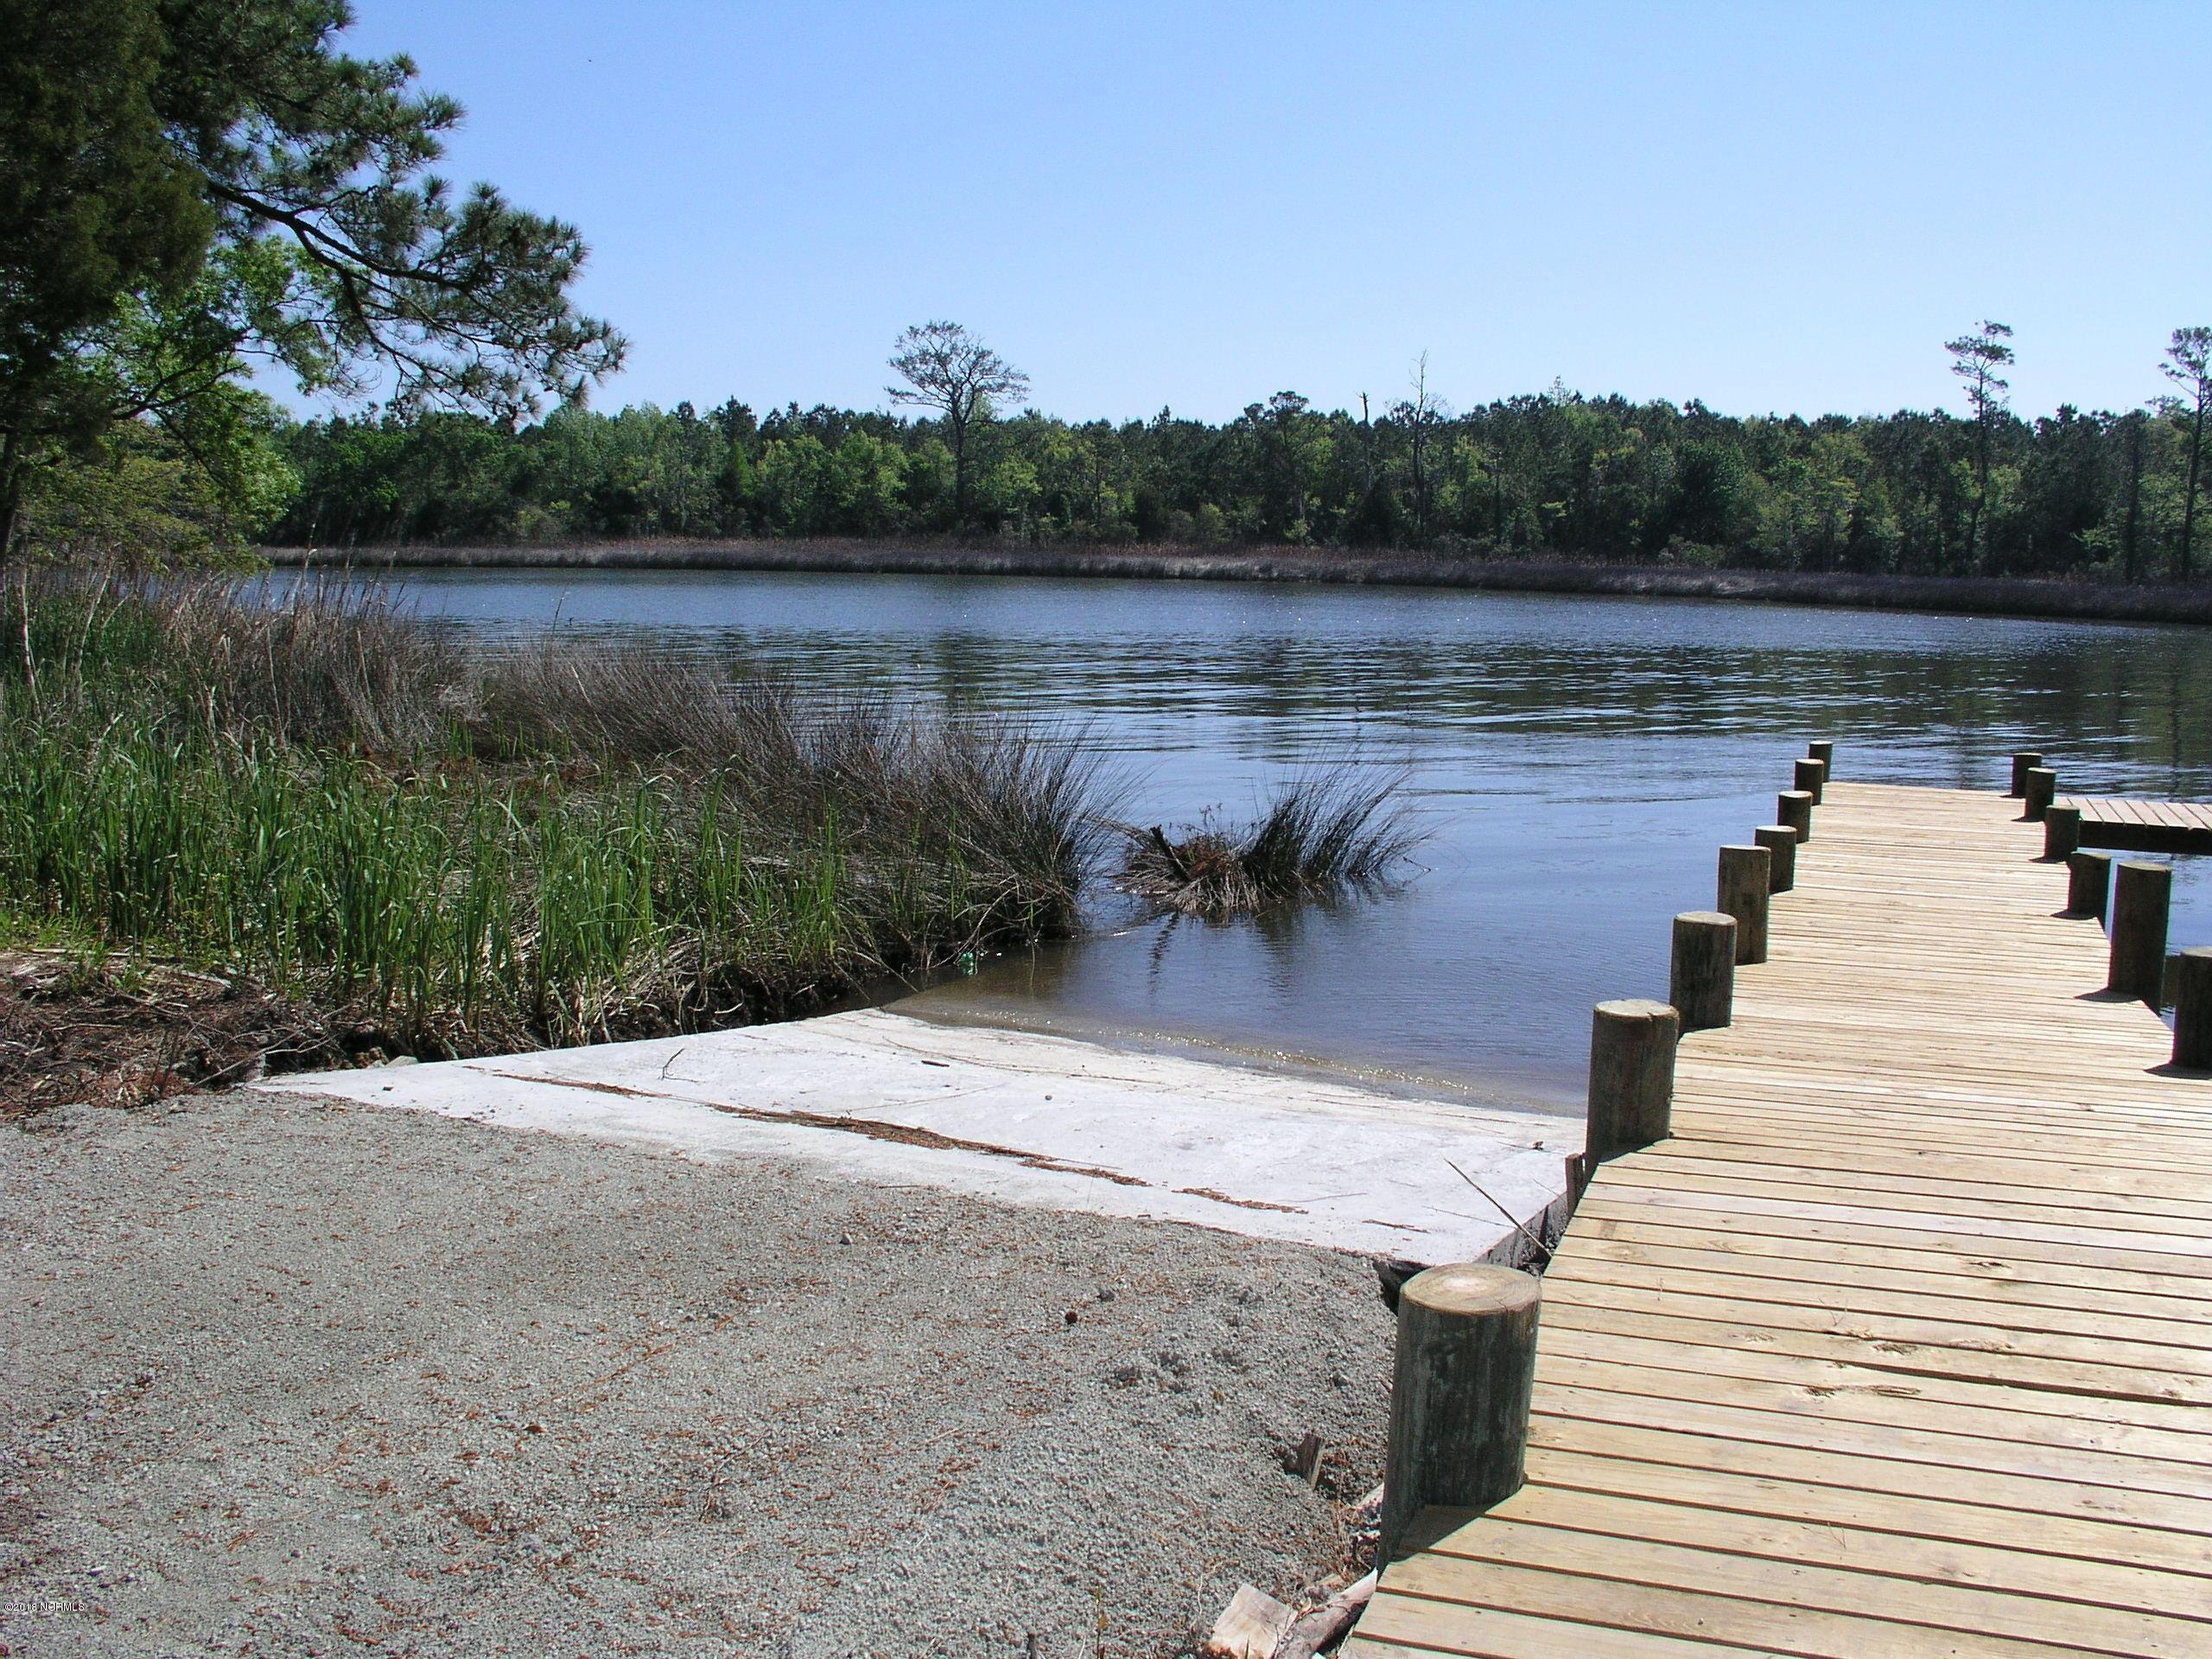 129 Garbacon Drive, Beaufort, North Carolina 28516, ,Residential land,For sale,Garbacon,100108712